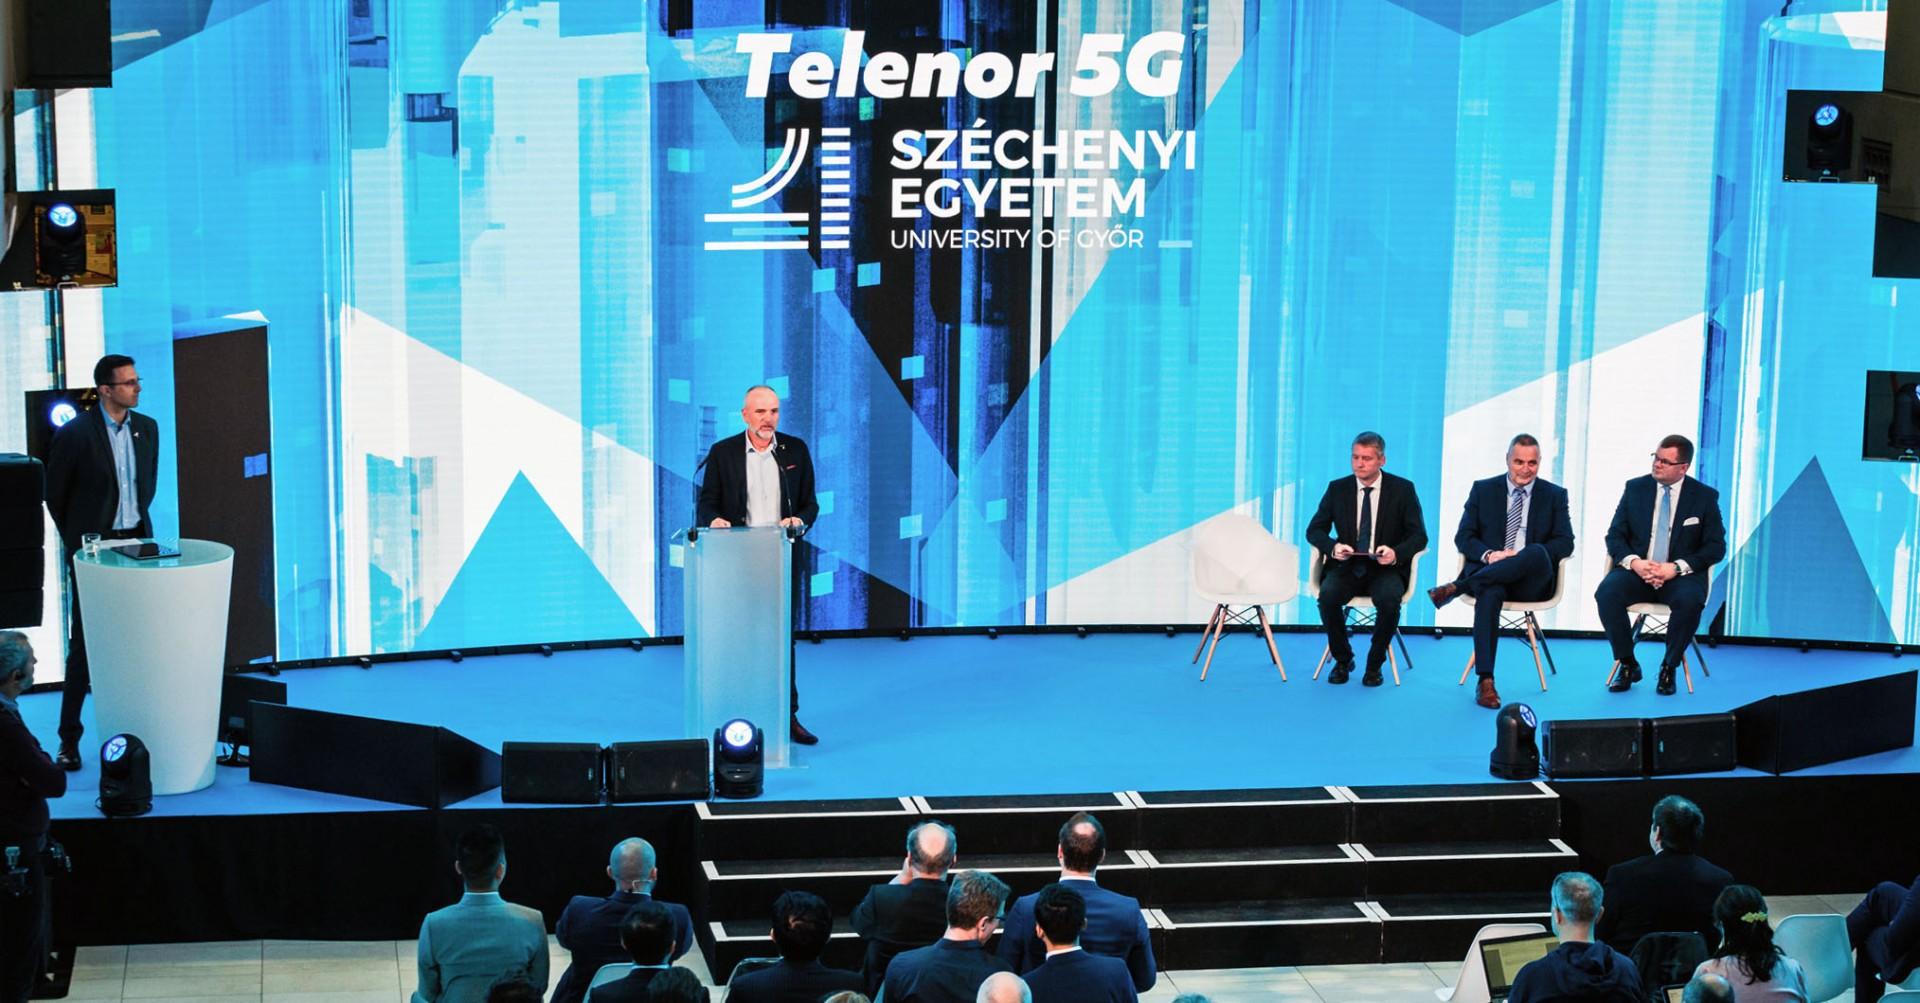 telenor-hungary-5g-test-network-launch-gyor